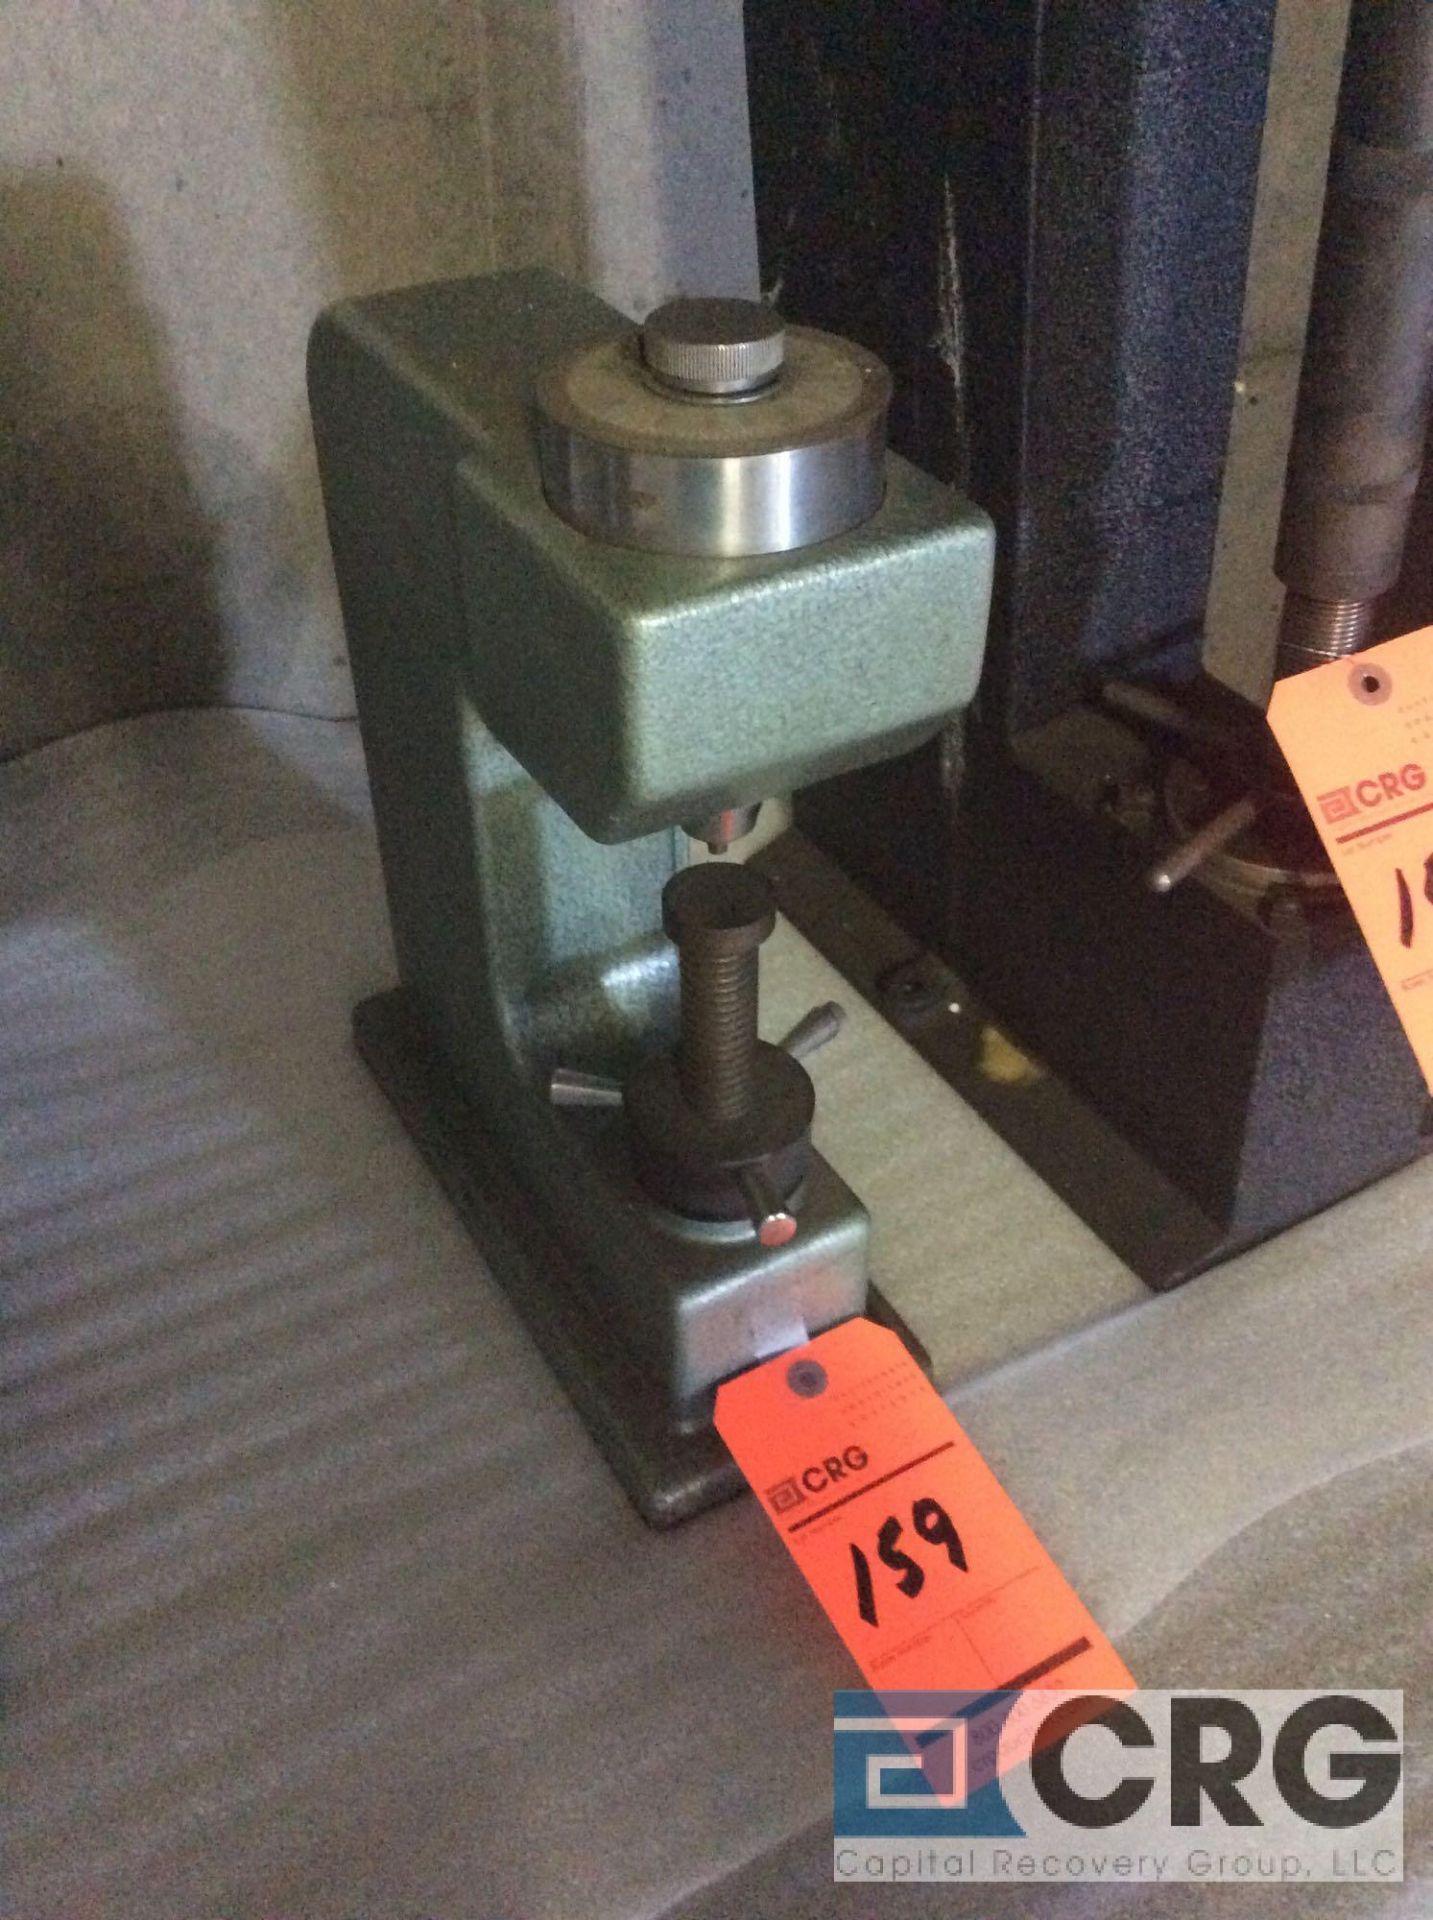 Lot 159 - hardness tester